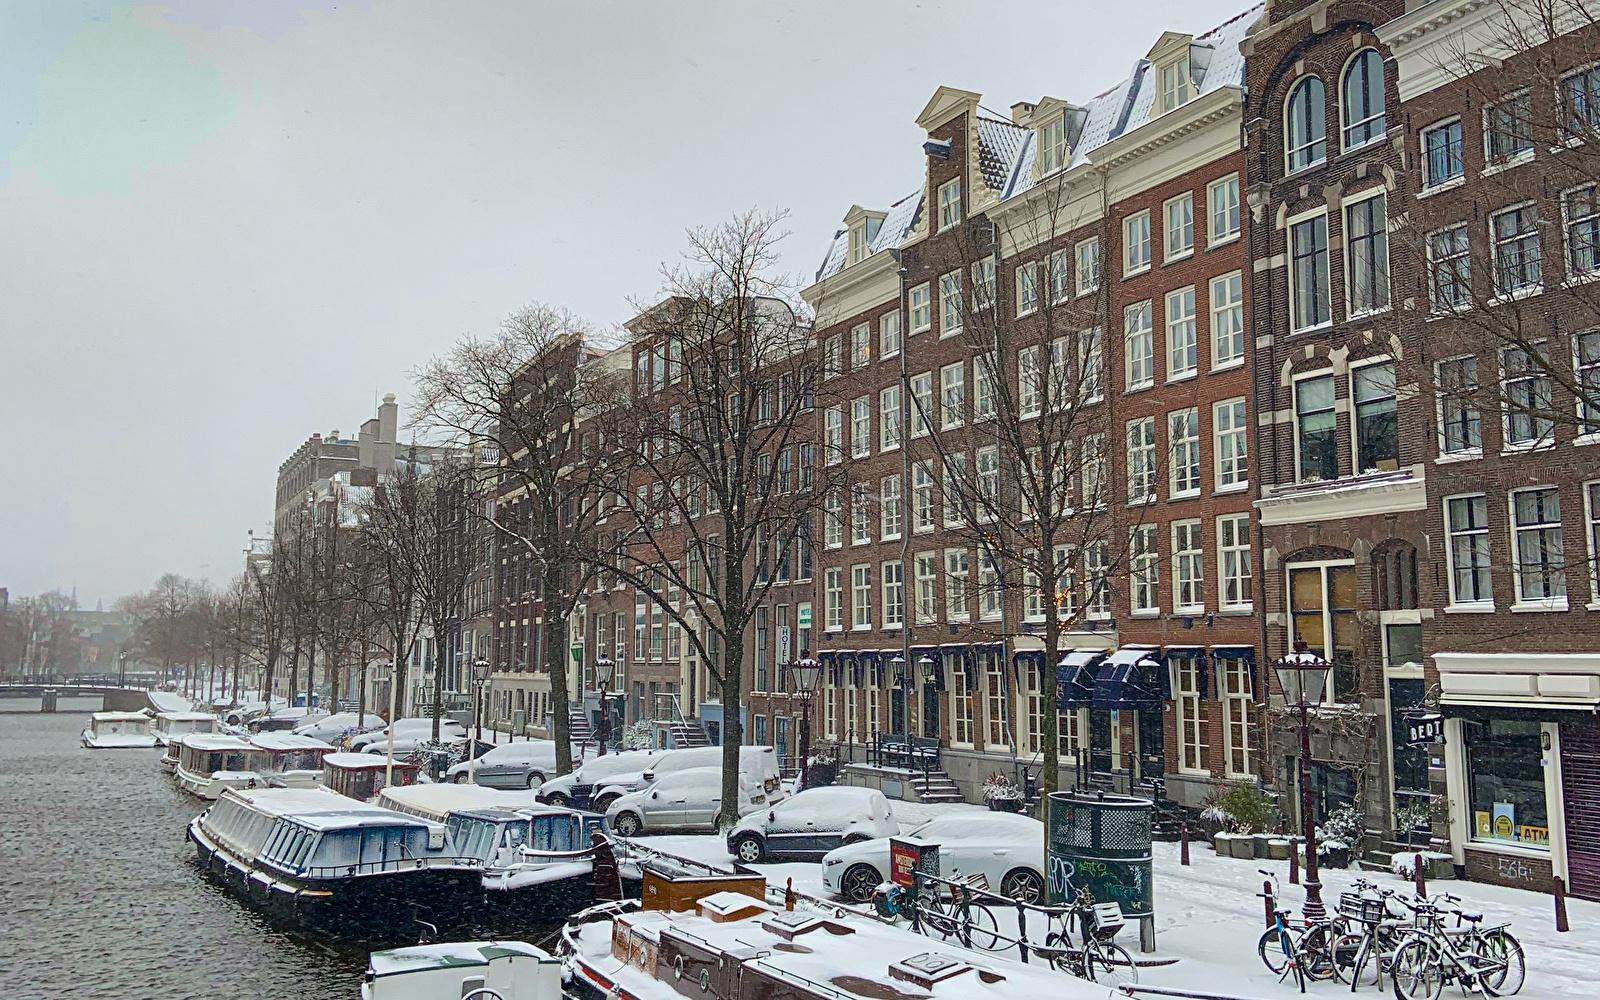 Winter's Amsterdam